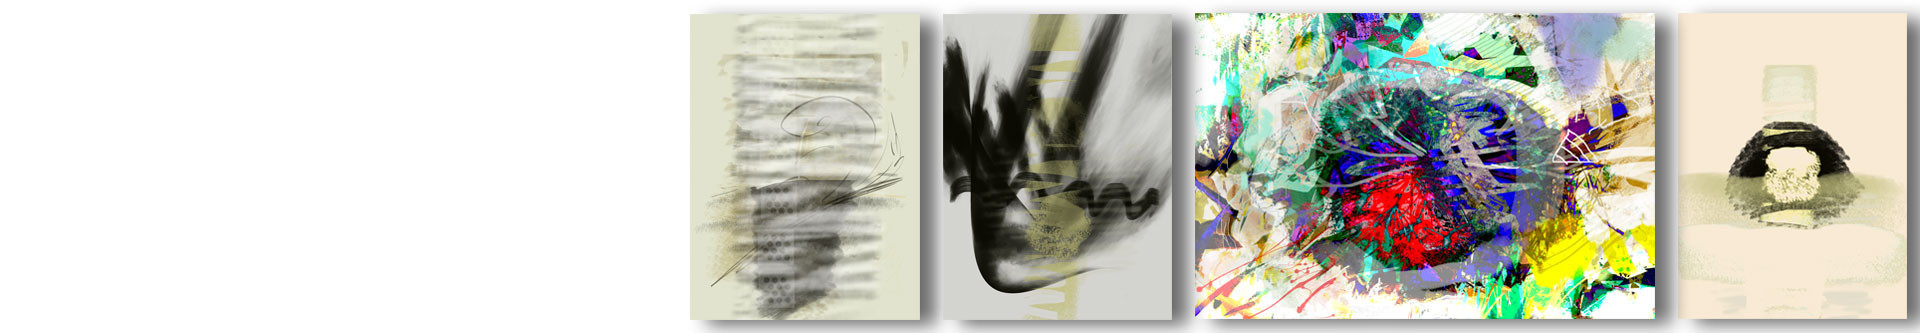 Obrazy abstrakcyjne i plakaty • designerskie grafiki abstrakcje • grafikiobrazy.pl